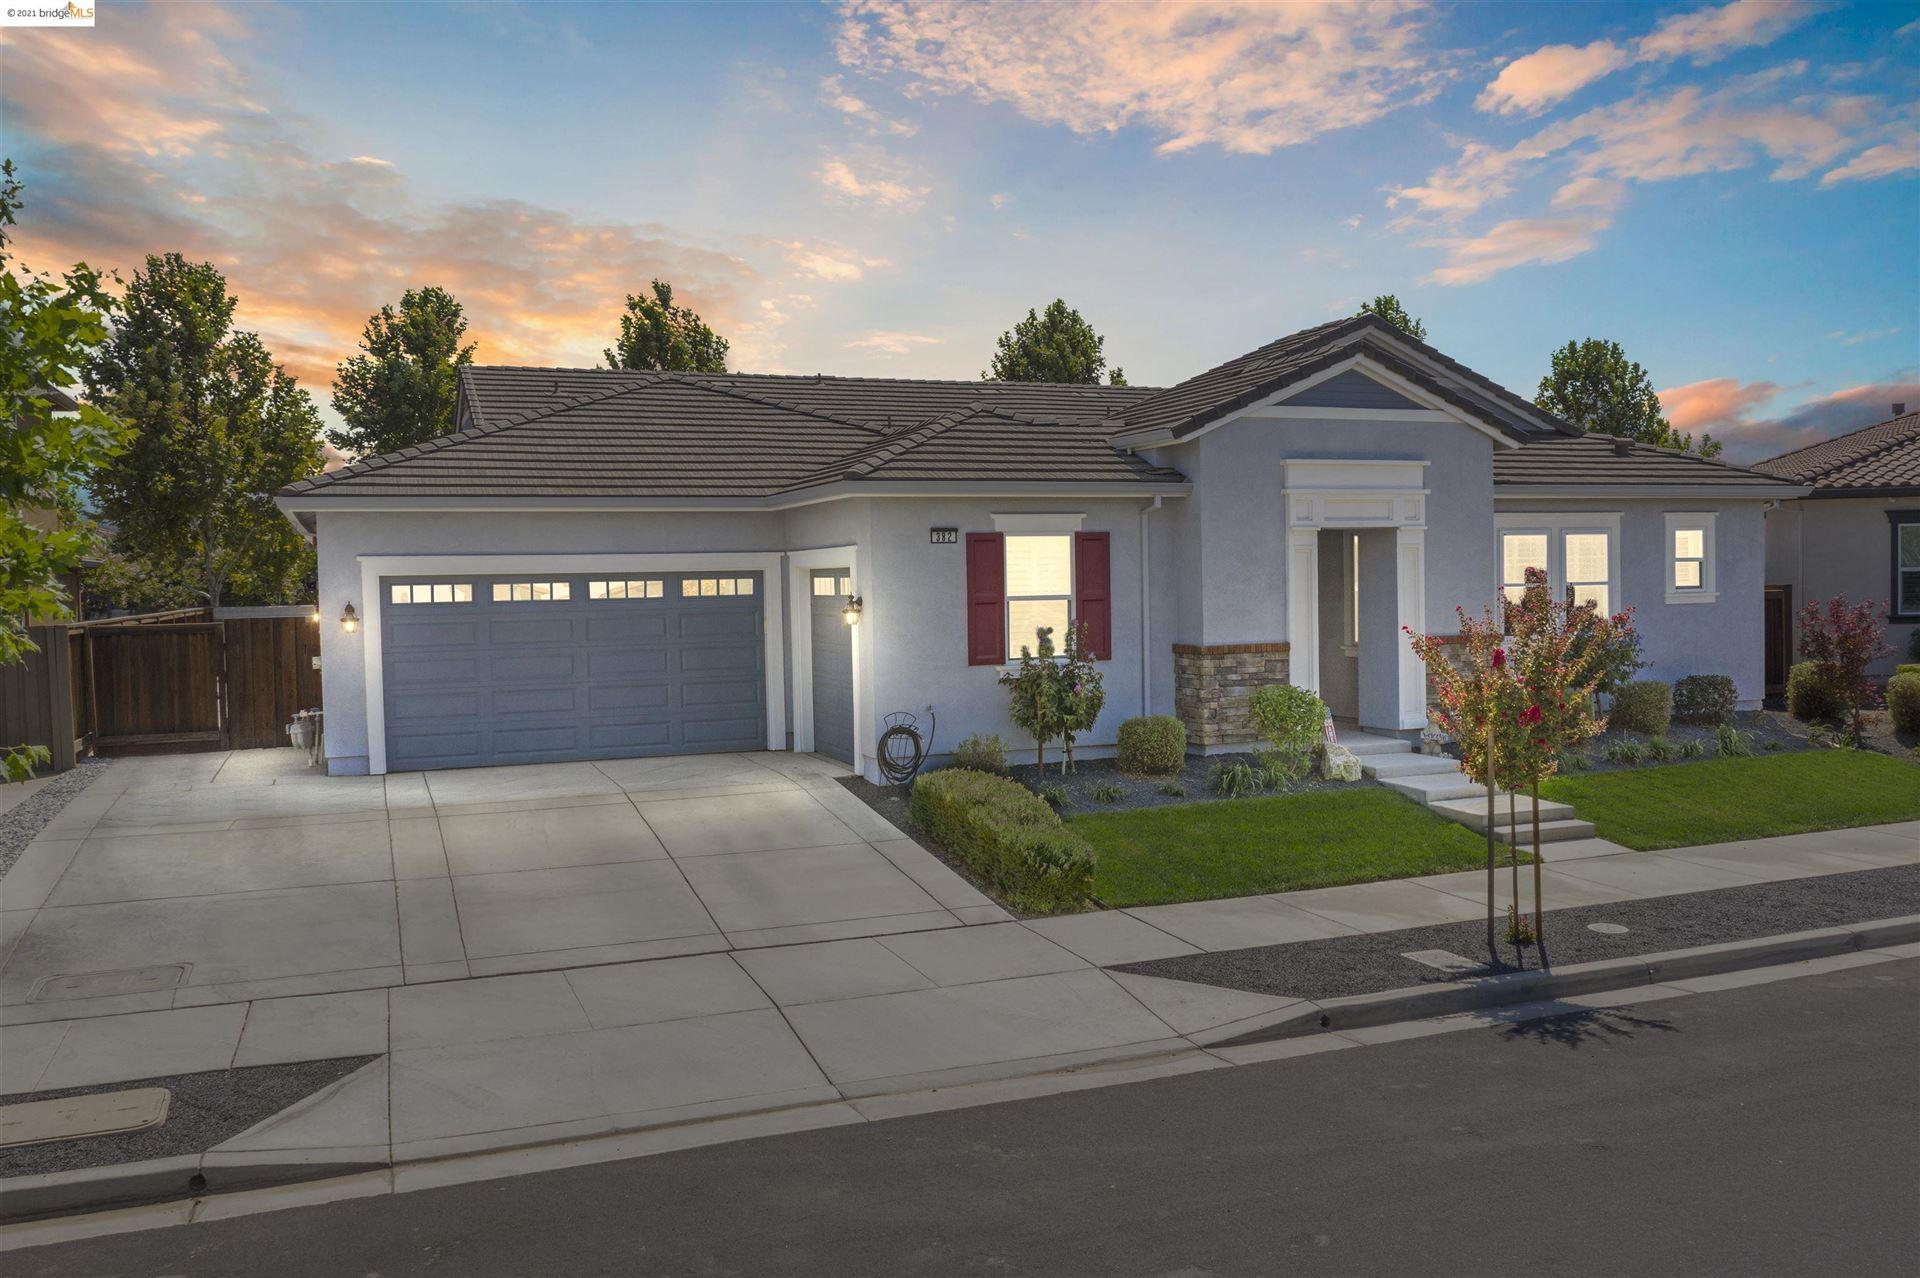 Photo of 382 Stonington Court, BRENTWOOD, CA 94513-2421 (MLS # 40964847)